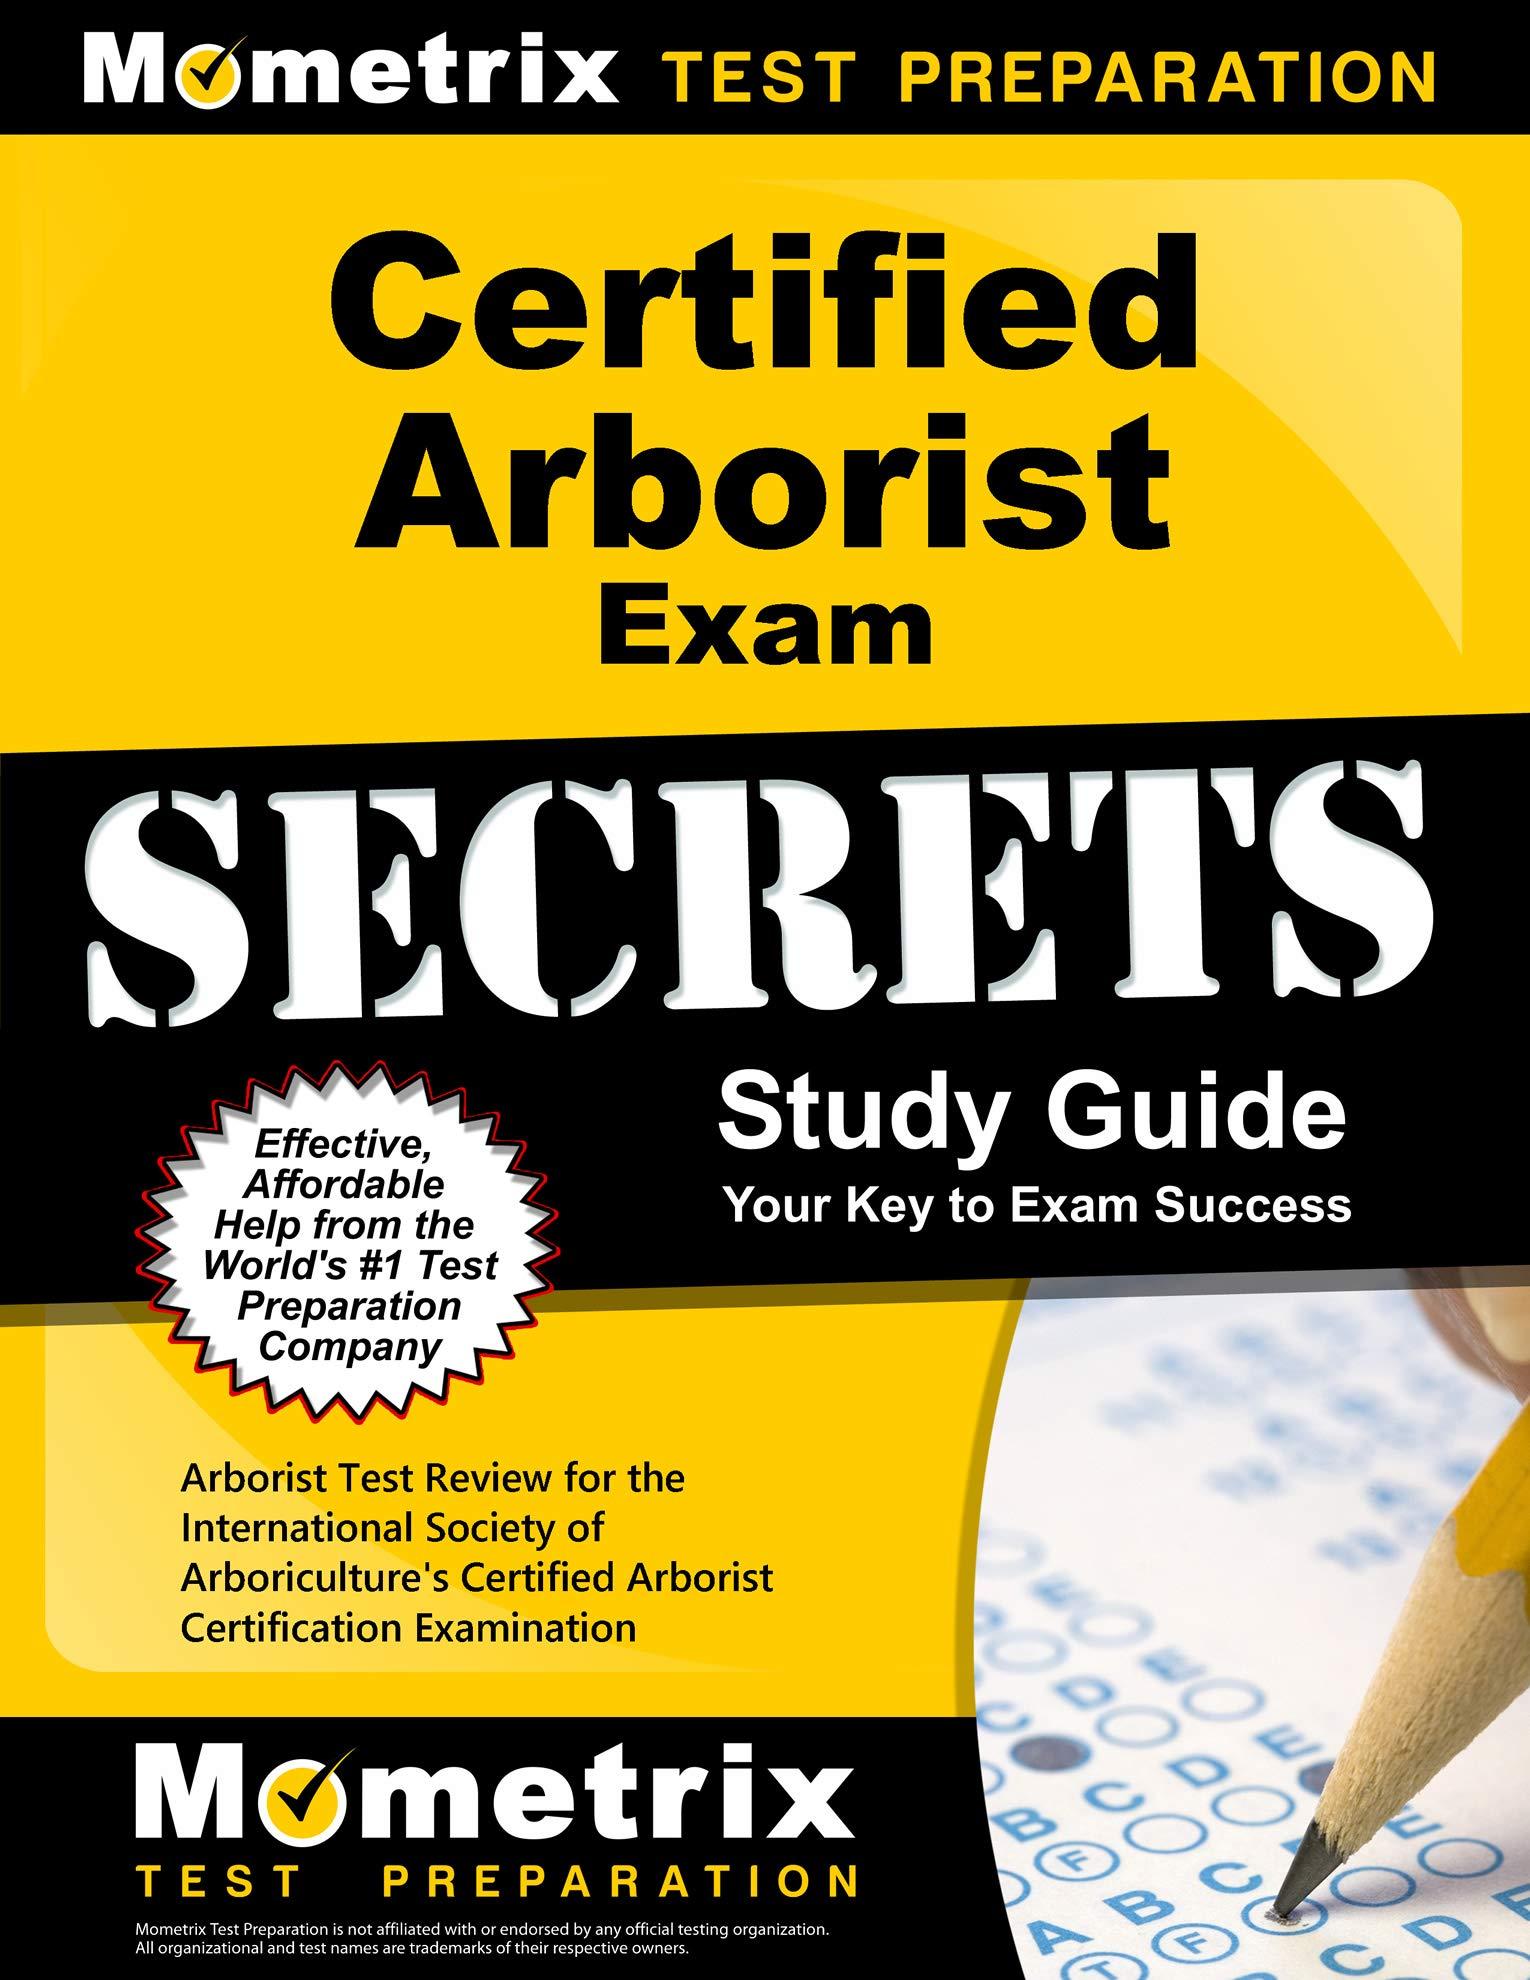 Certified Arborist Exam Secrets Study Guide: Arborist Test Review for the International Society of Arboriculture's Certified Arborist Certification Examination (Mometrix Secrets Study Guides) by Mometrix Media LLC